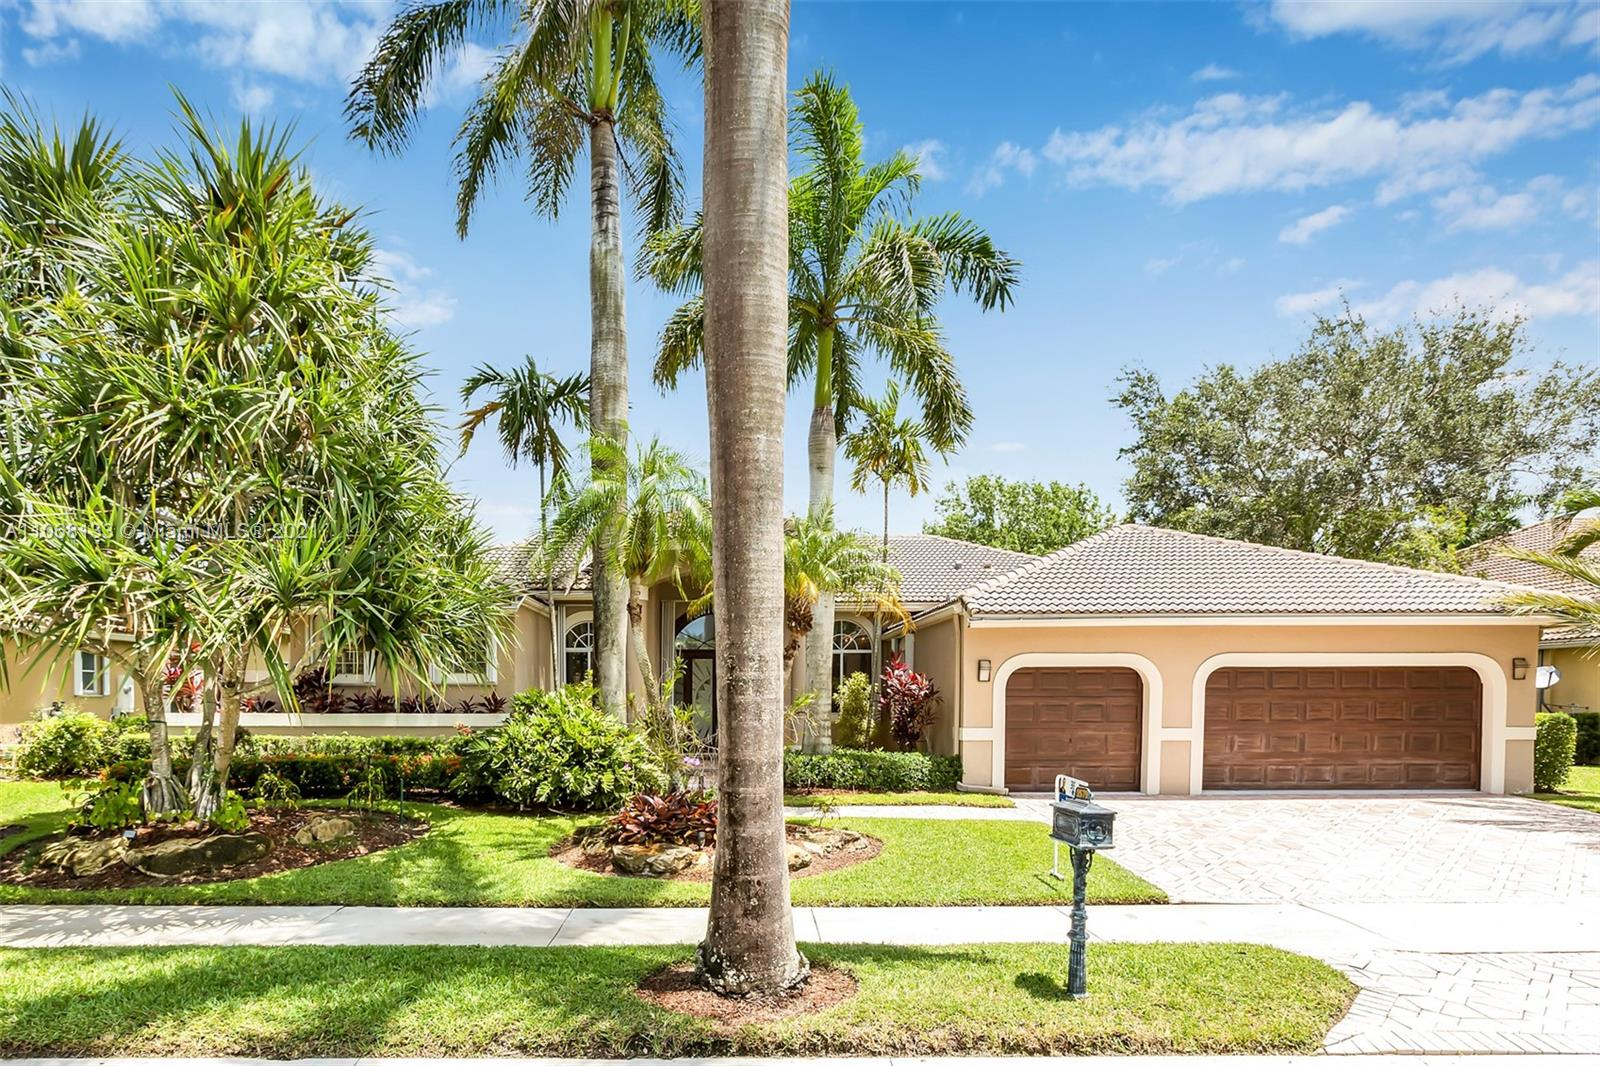 Weston Hills - 2579 Mayfair Ln, Weston, FL 33327